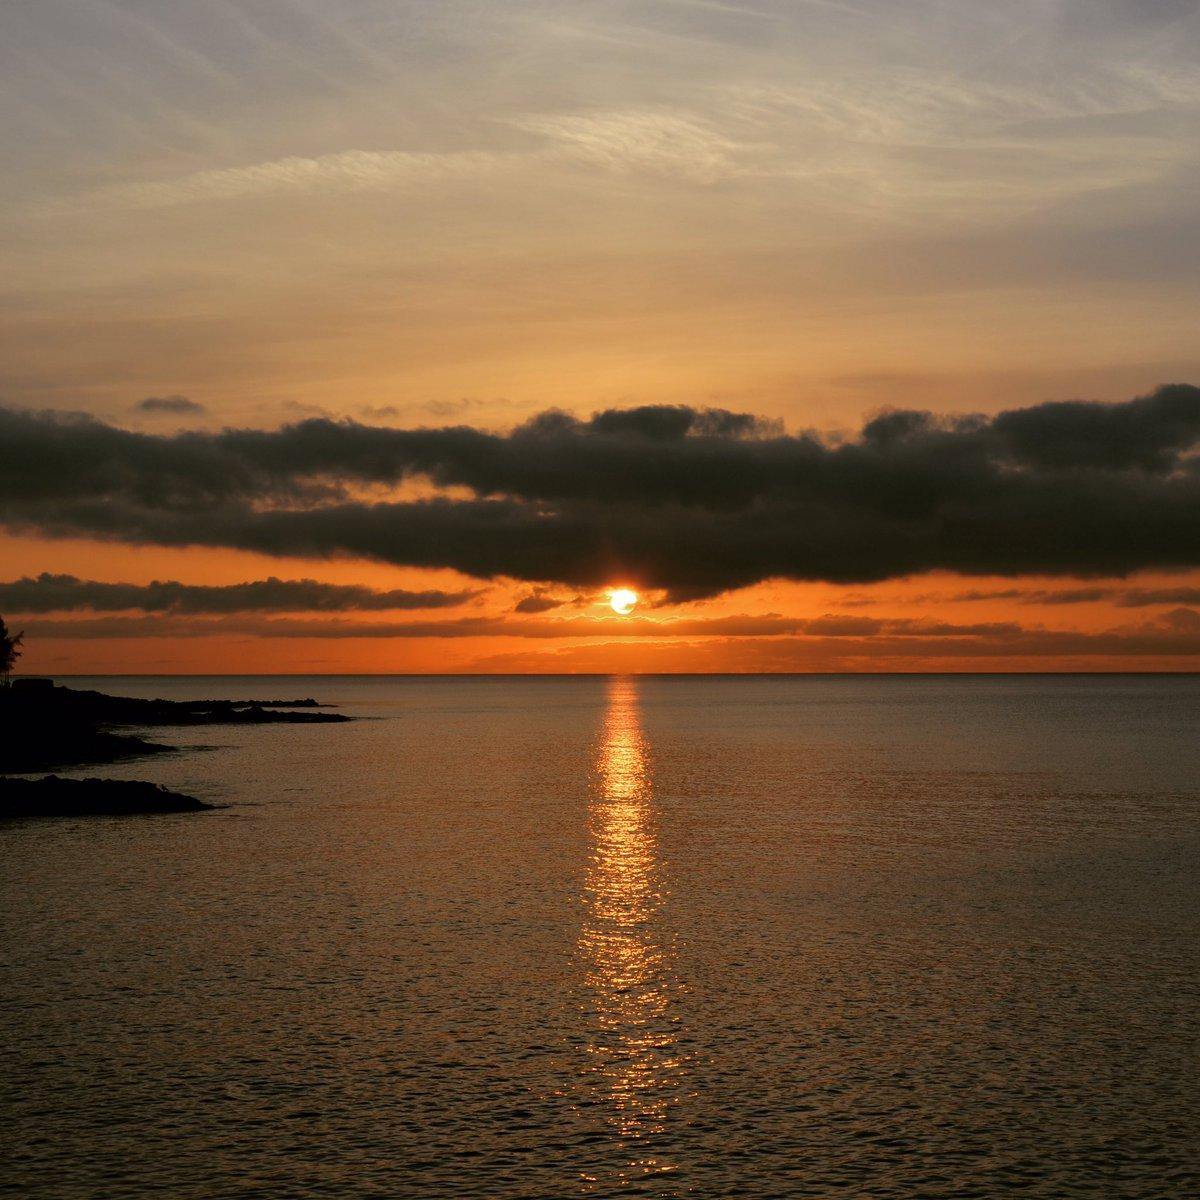 #sunrise #sunset #nature #sky #photography #travel #landscape #sun #frasesdeamor #beach #love #beautiful #photooftheday #morning #paisaje #picoftheday #sunsets #leica #amanecer #minolta #travelphotography #nikonphotography #photographer #canon #grancanaria #sonypic.twitter.com/iy066C6m9a